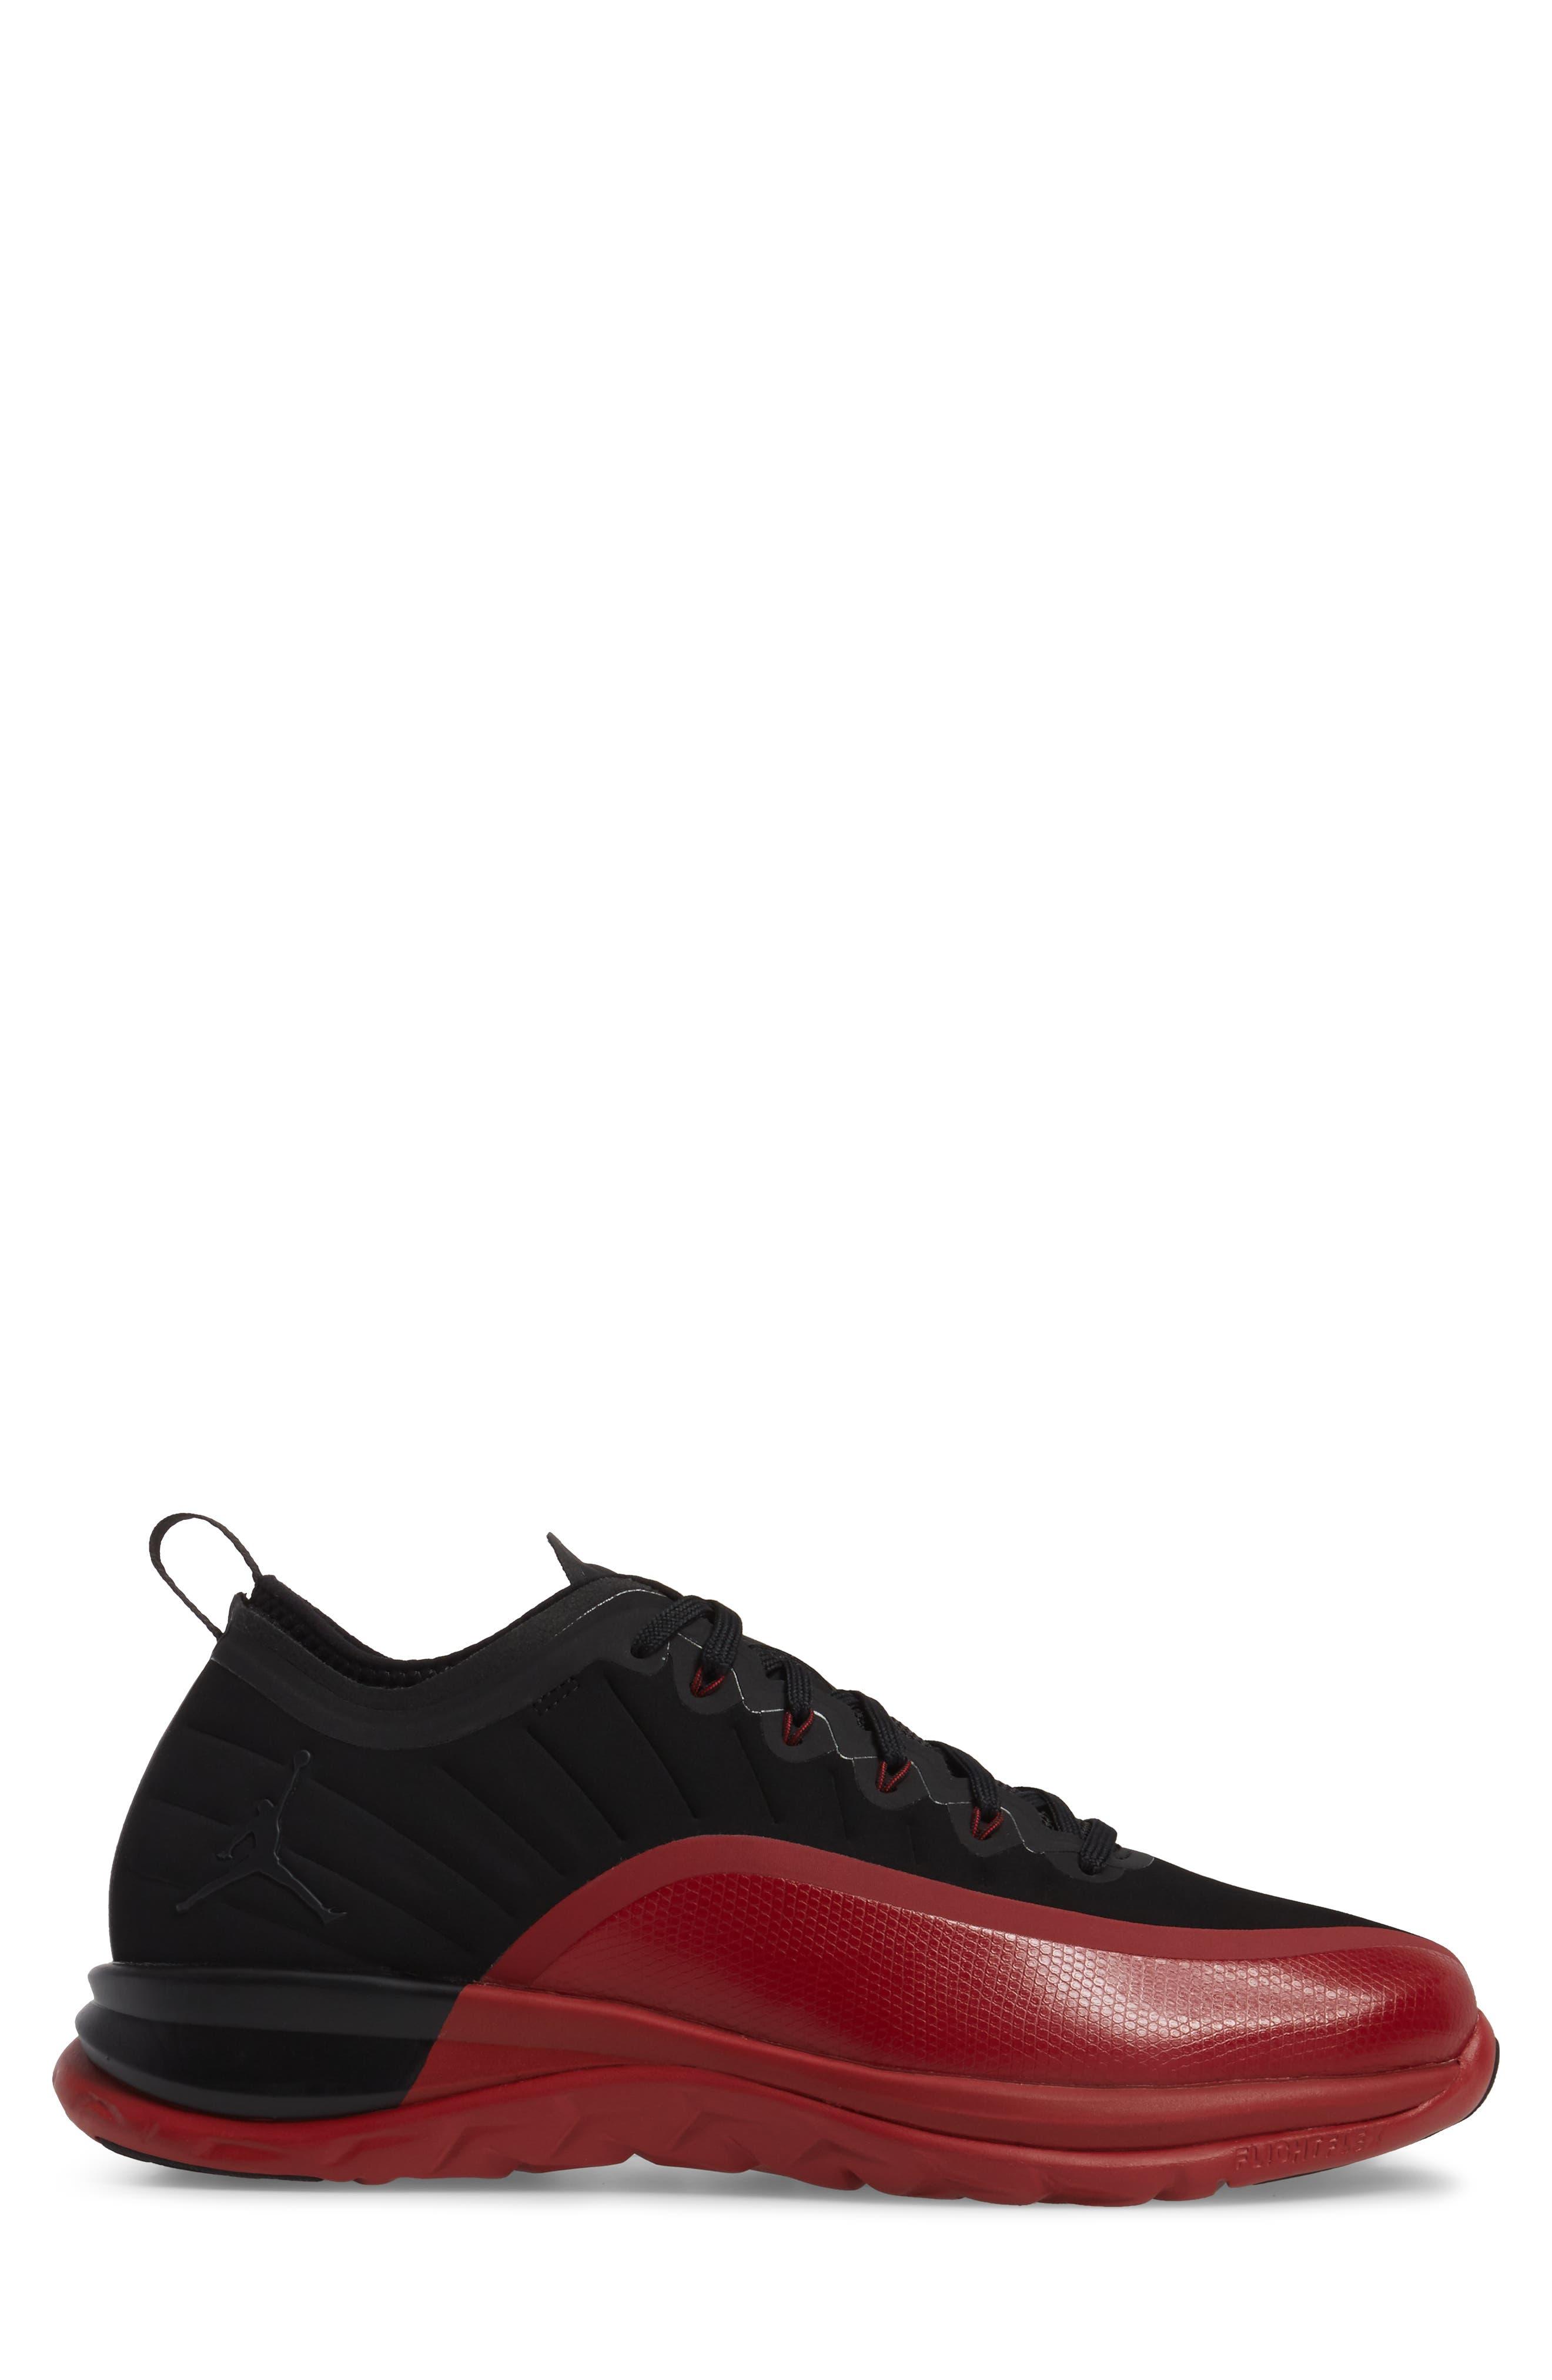 Jordan Trainer Prime Sneaker,                             Alternate thumbnail 3, color,                             Black/ Black/ Gym Red